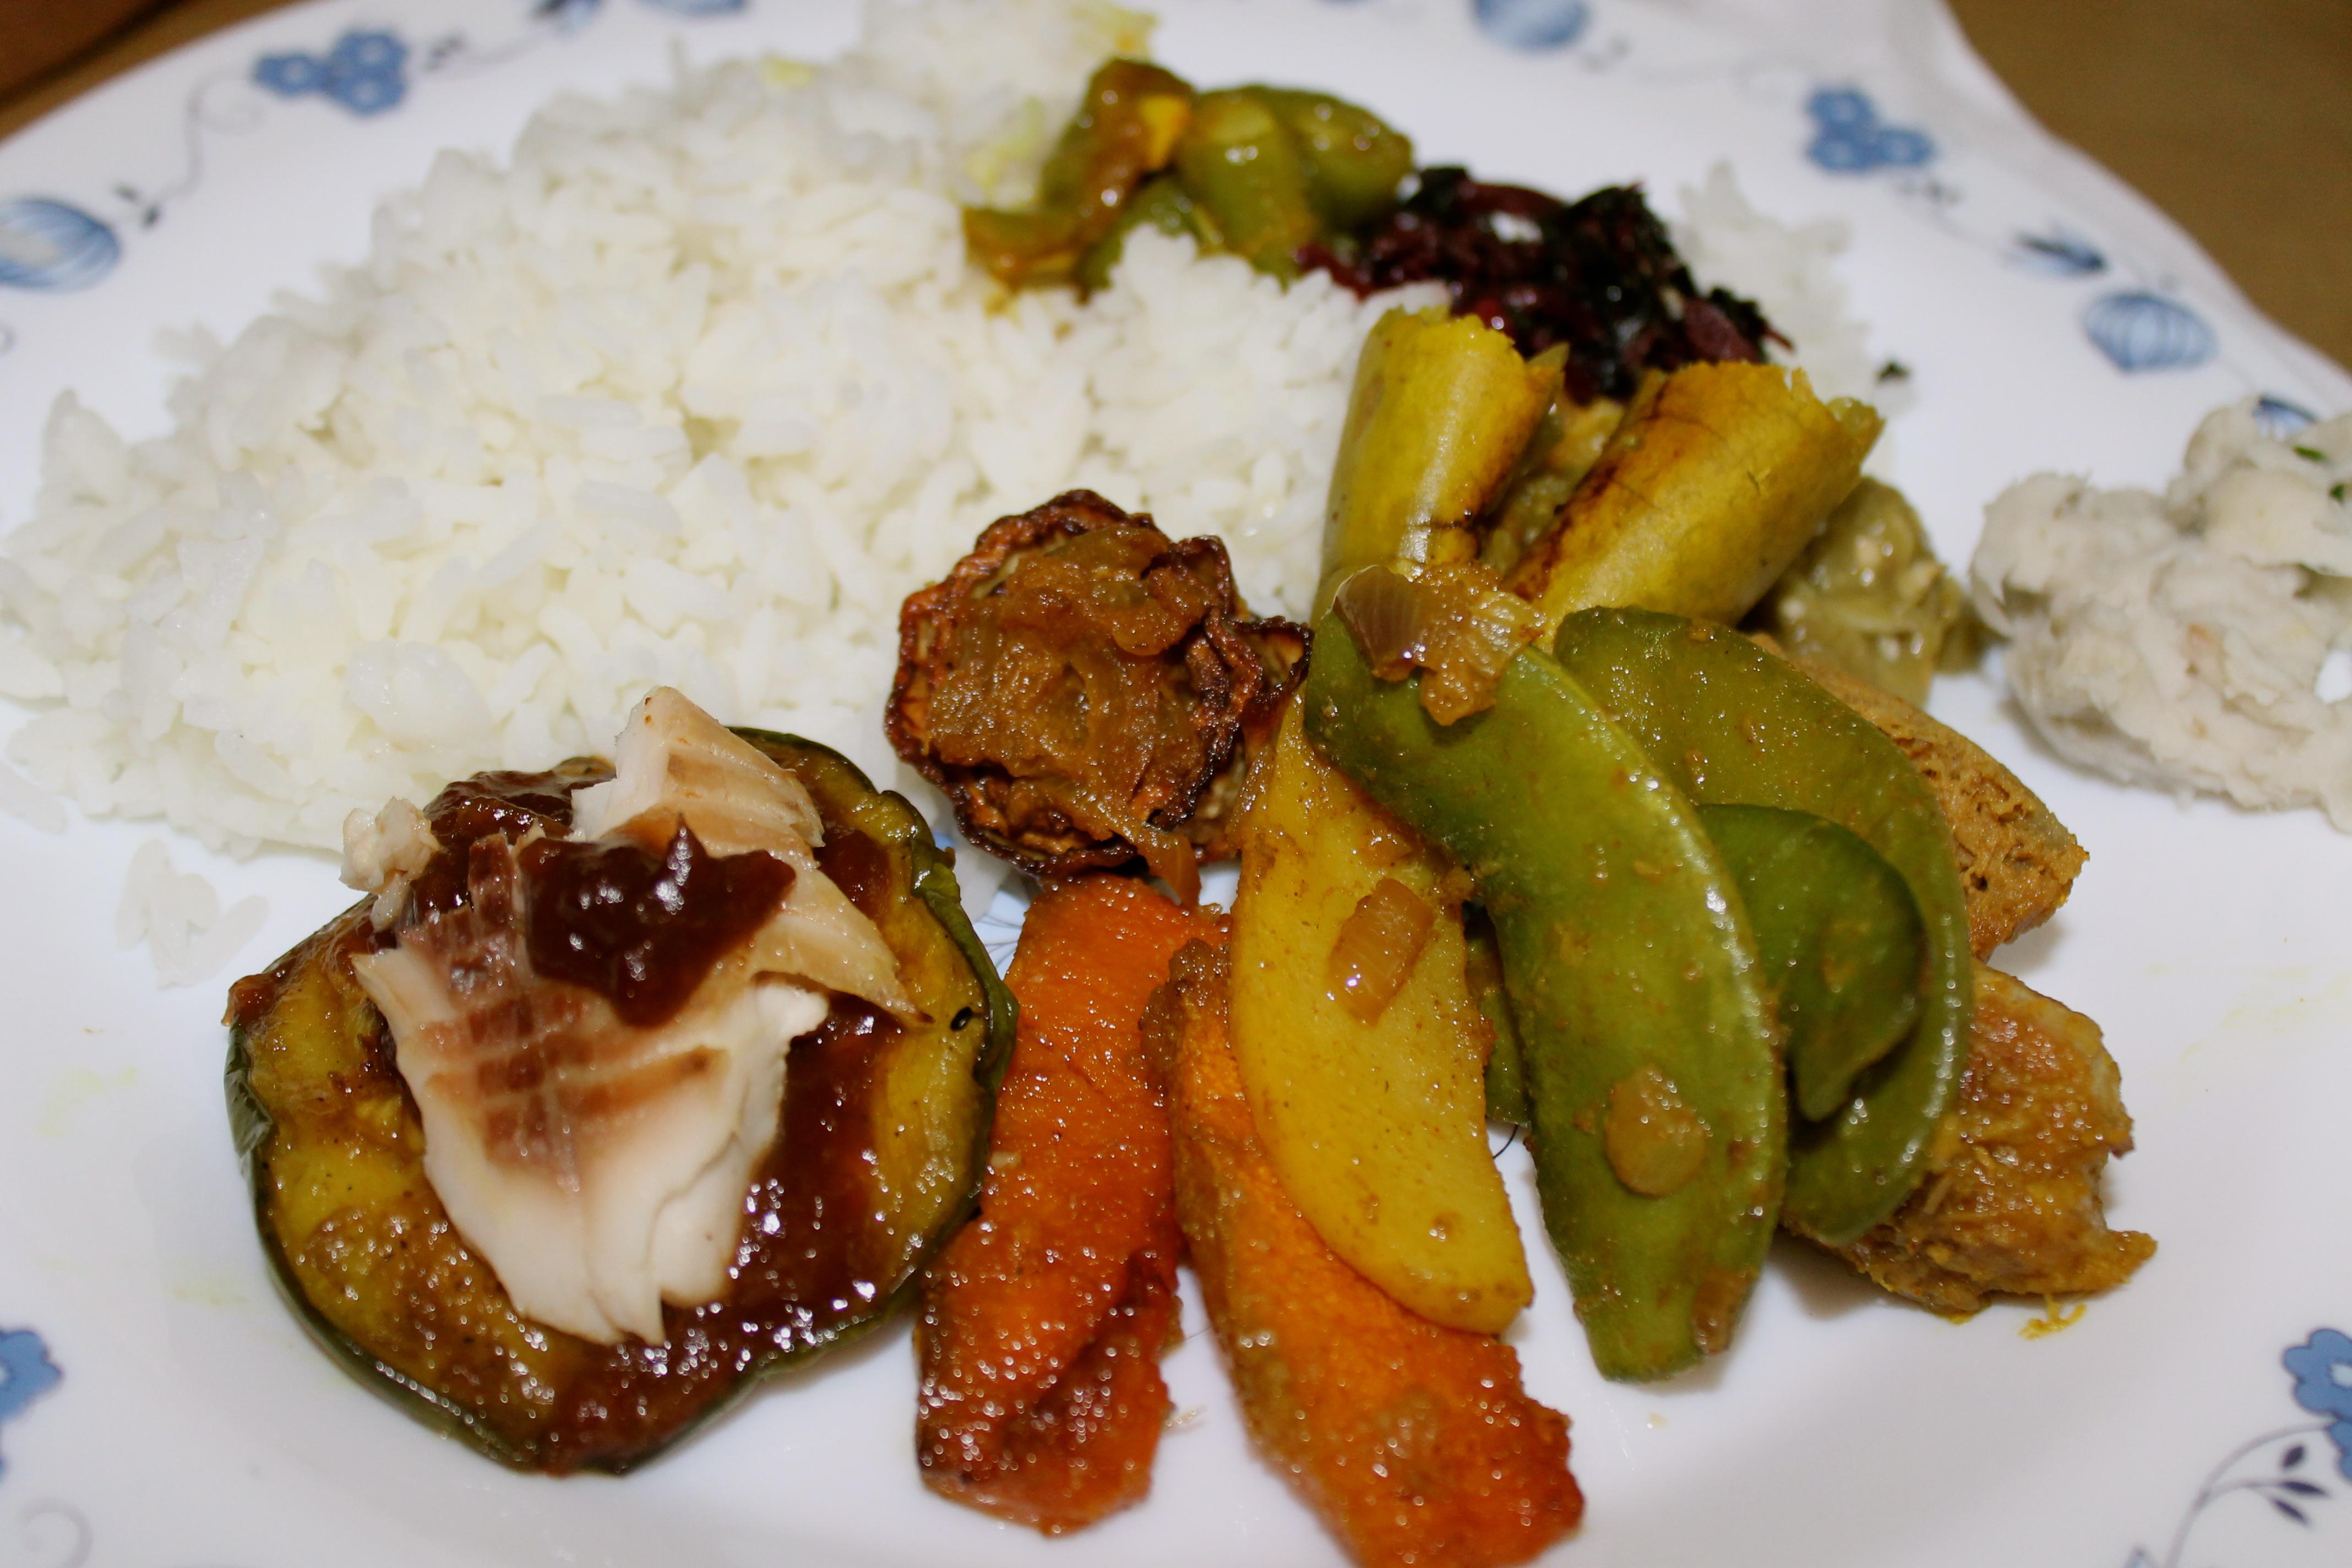 Eggplant, fish, squash, potato, taro root mash, gourd, peas, red ...